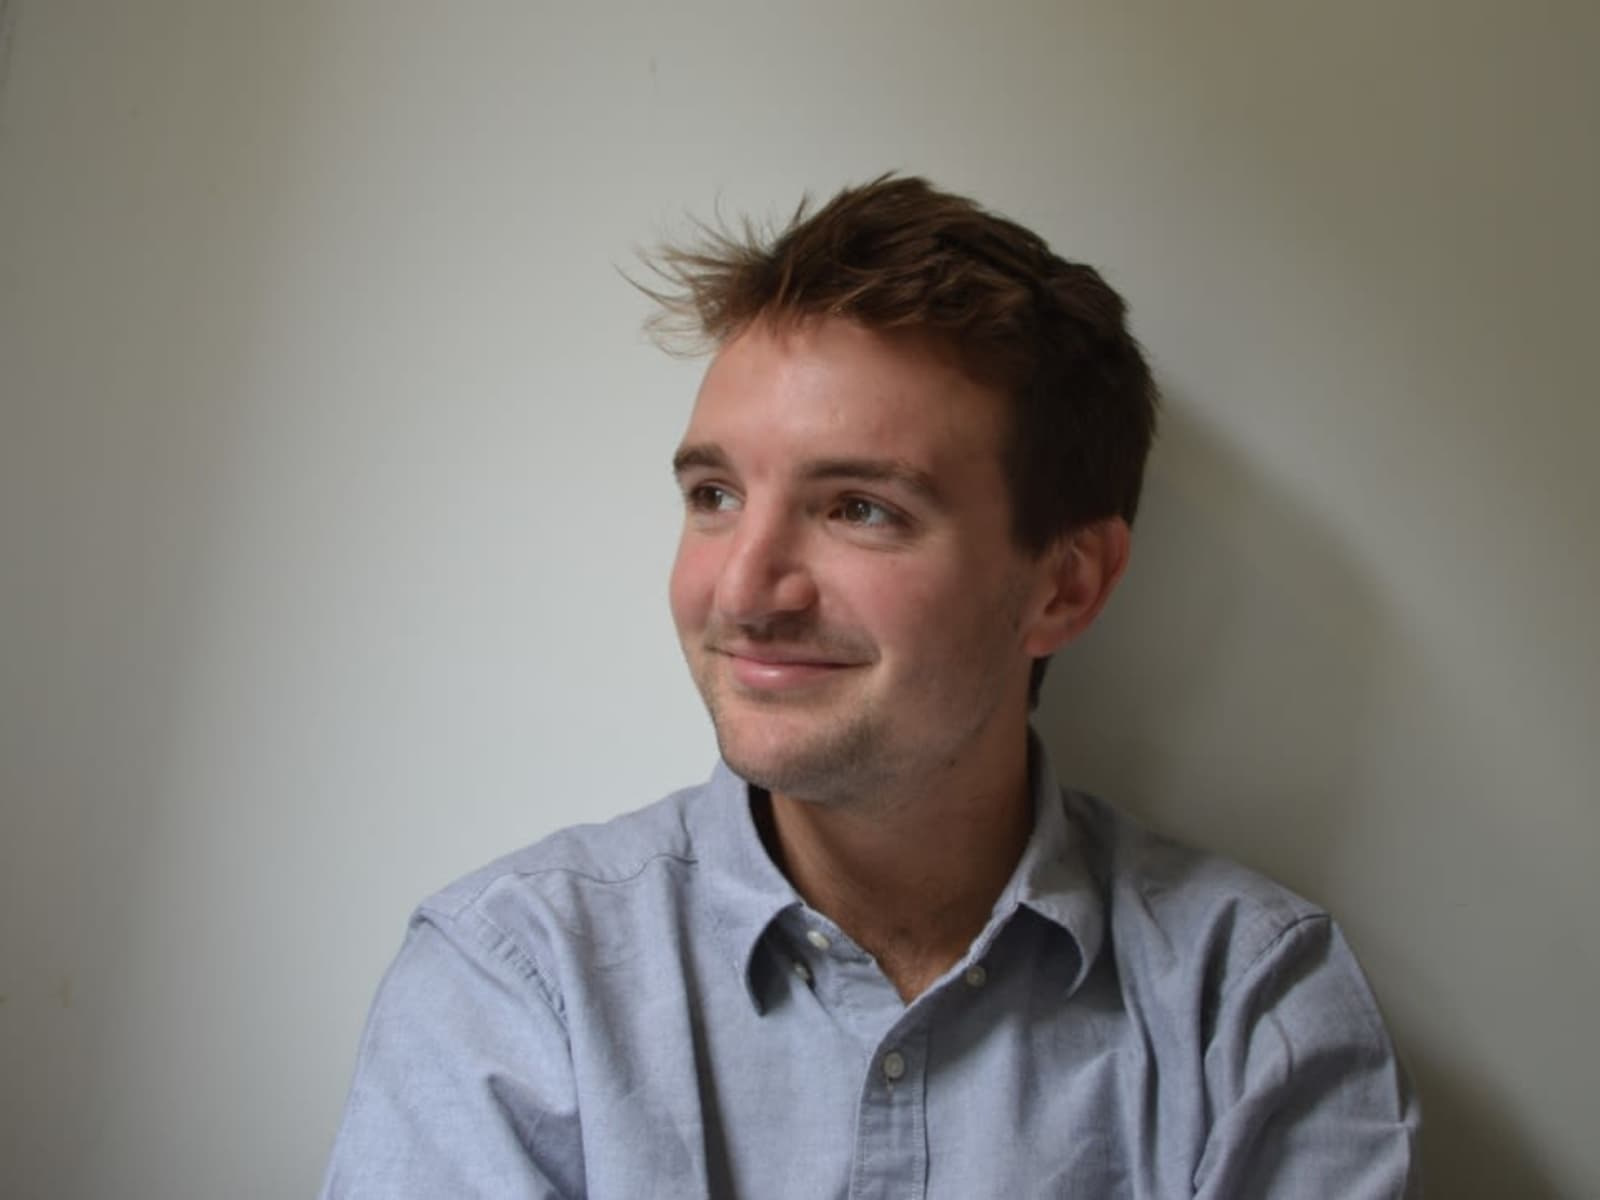 Anthony from London, United Kingdom